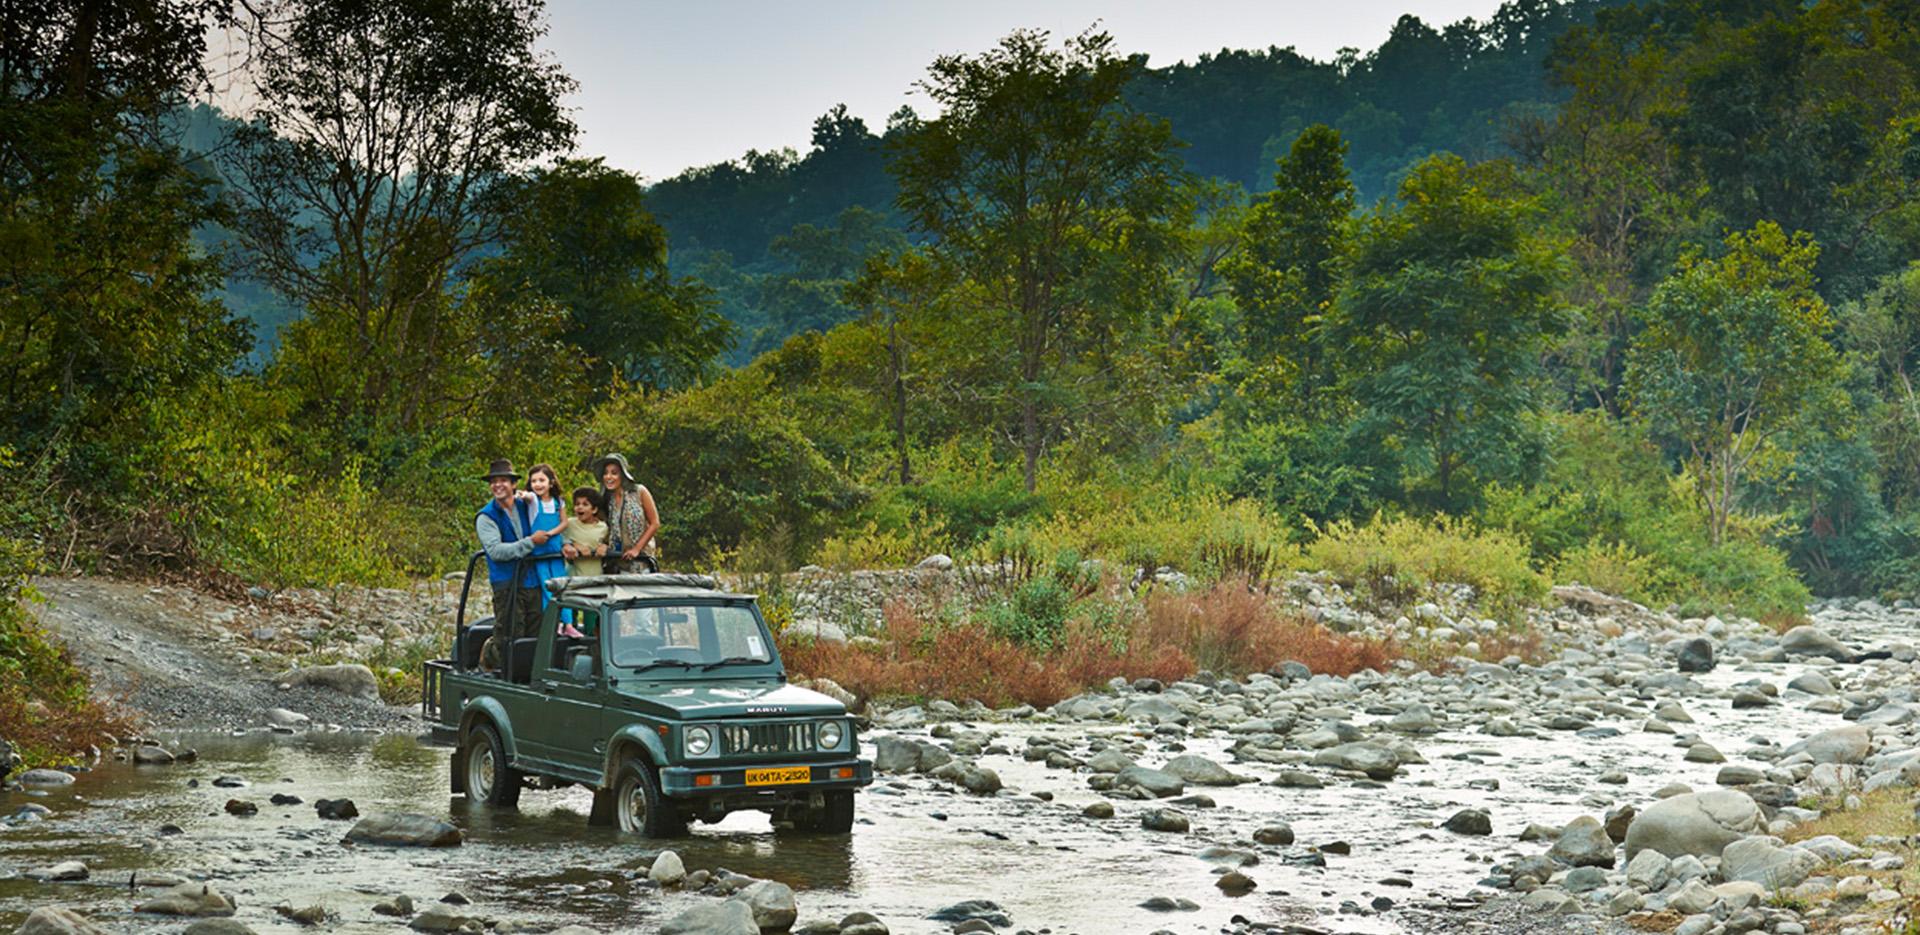 Bangalore, Kolkata, Mumbai, Delhi - 4 Weekend Getaways, 4 Unforgettable Vacations